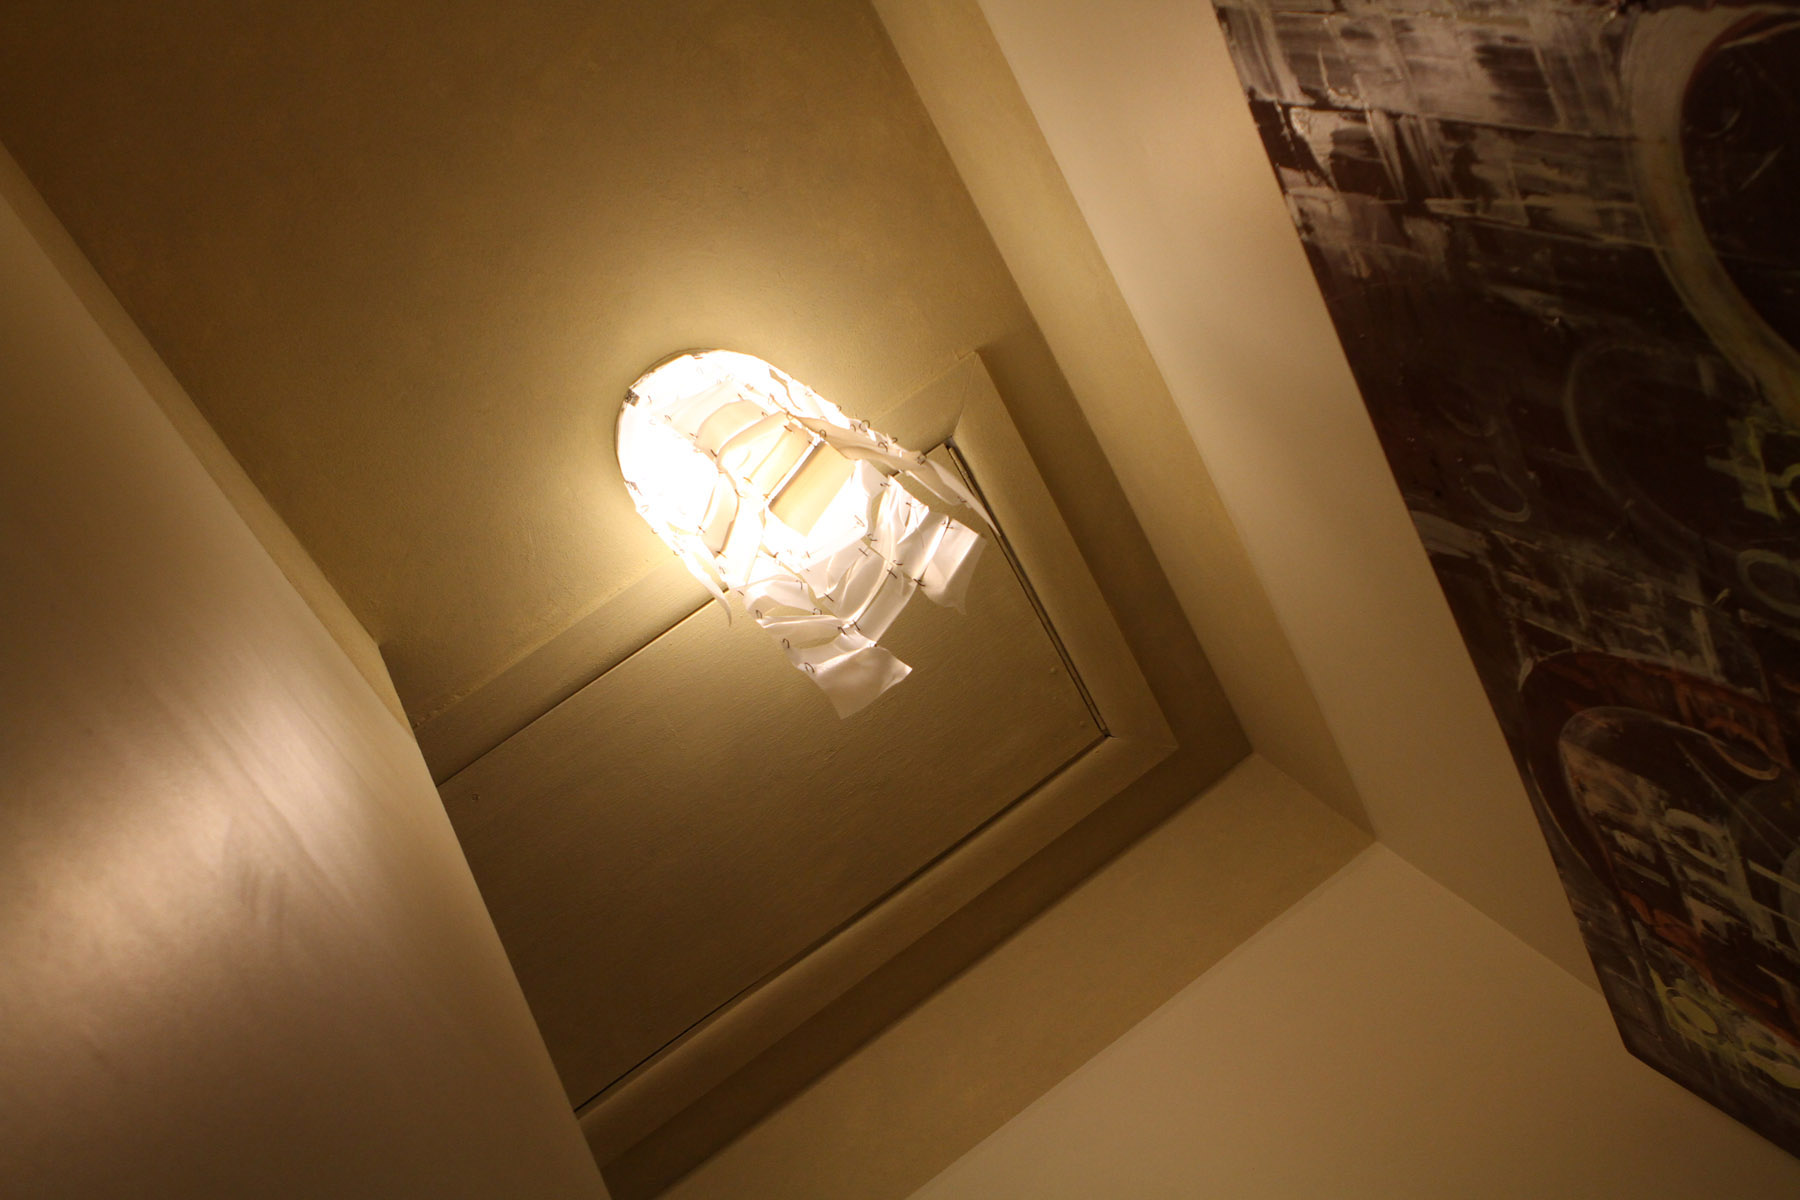 P4_58pieces of light.jpg